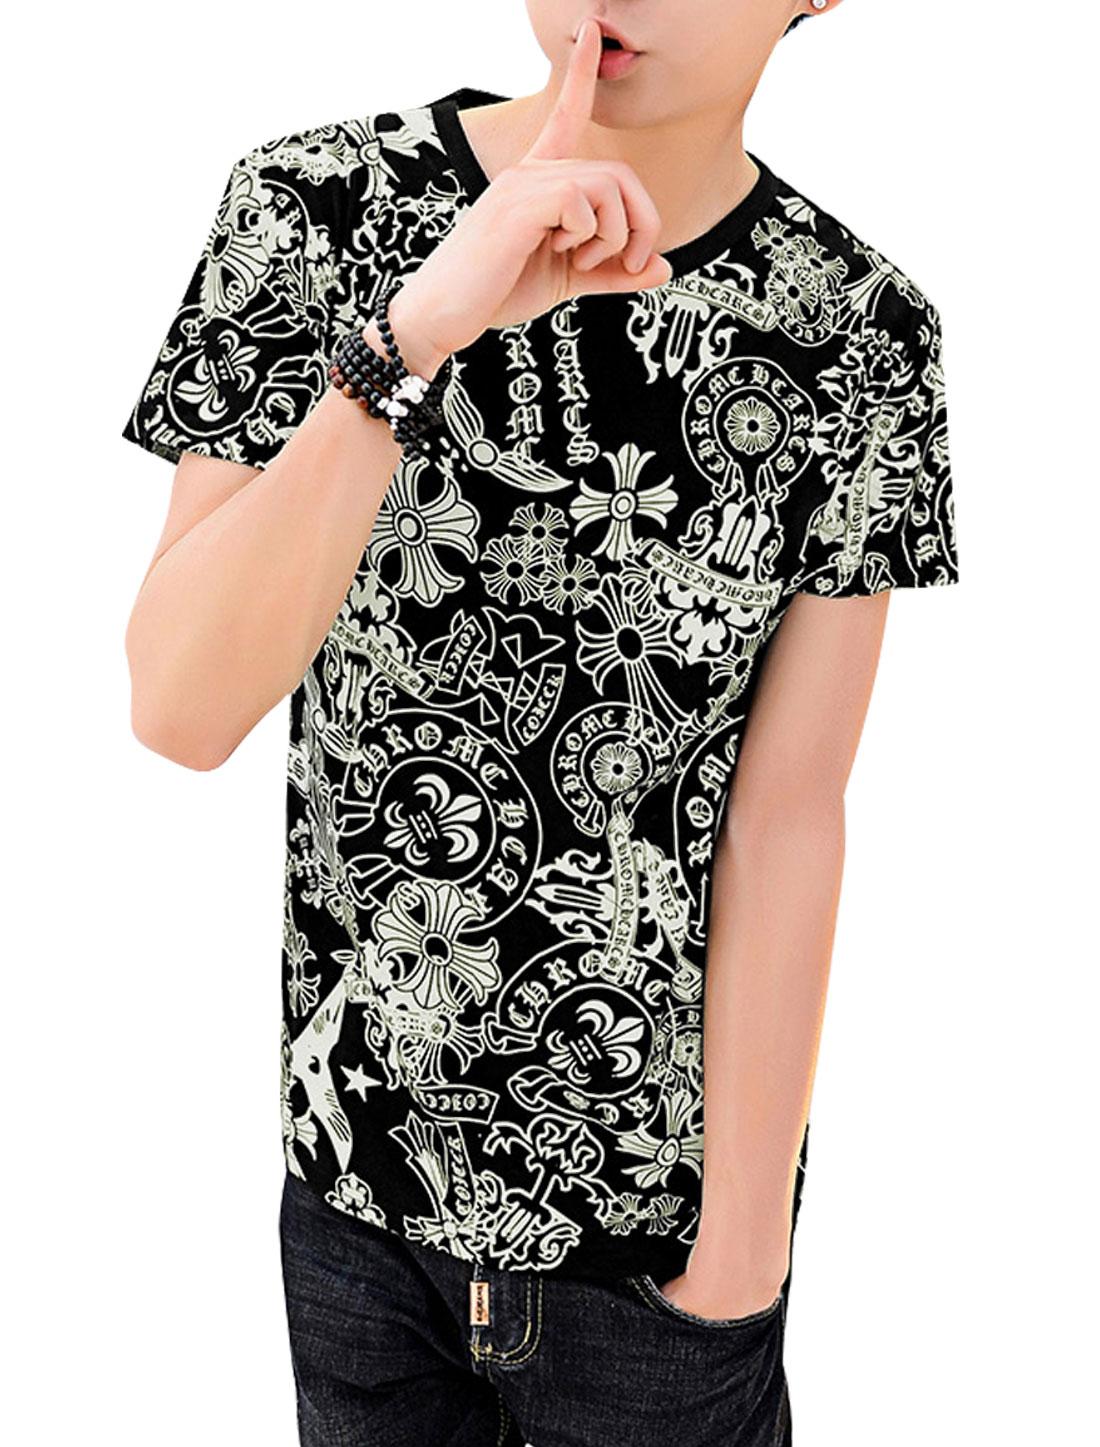 Men Short Sleeve Round Neck Novelty Print Leisure Summer T-Shirt Black M